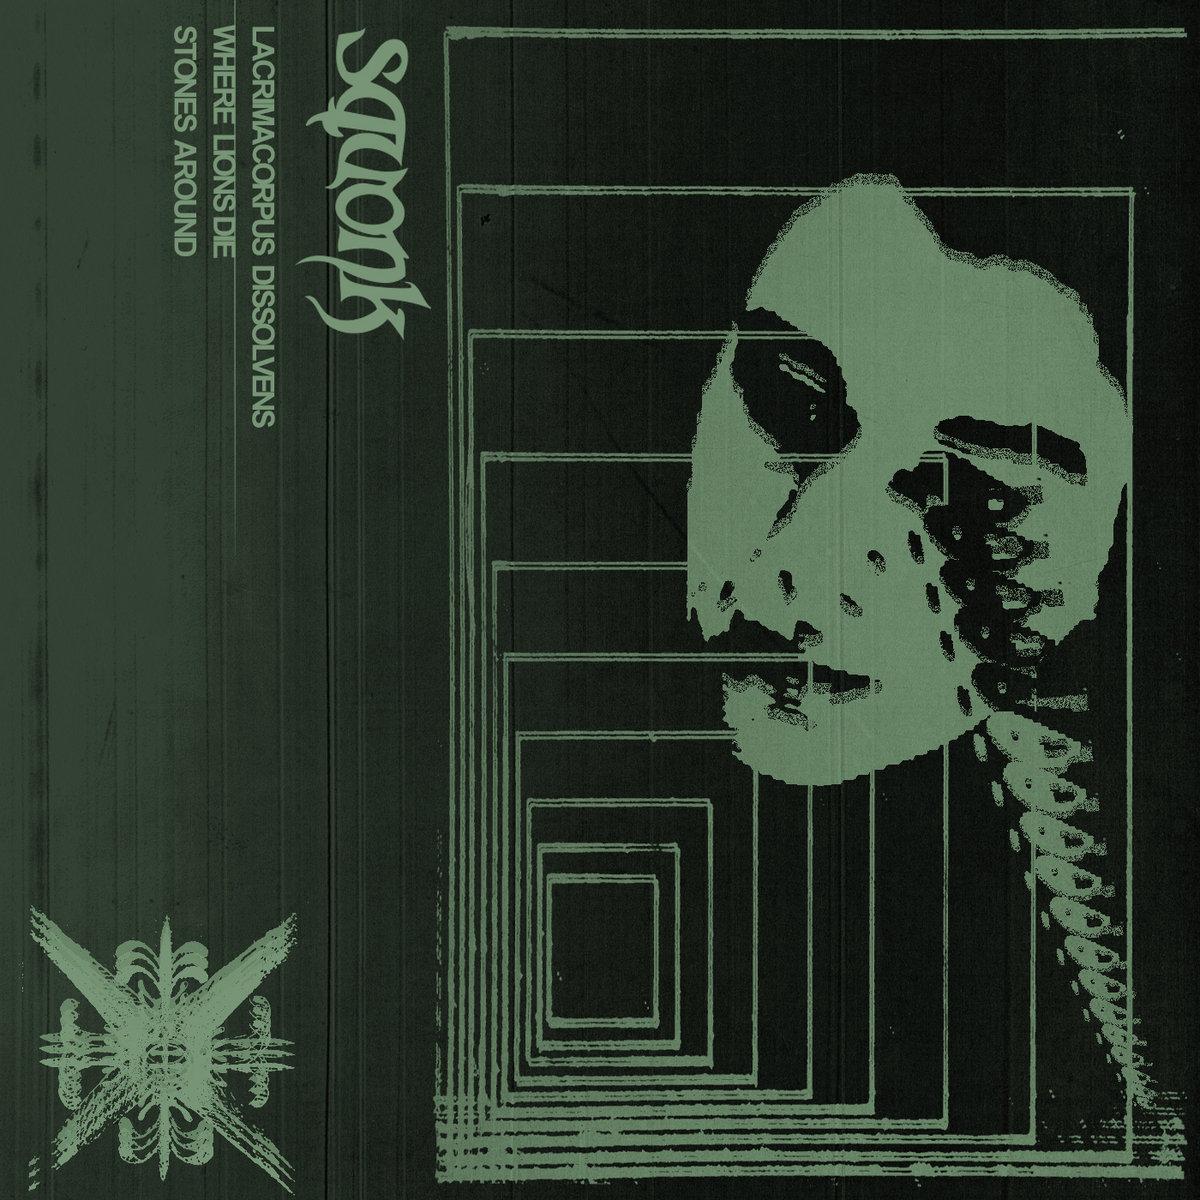 Squonk - Alghero - doom - Bandcap - player - 2020 - Sa Scena Sarda